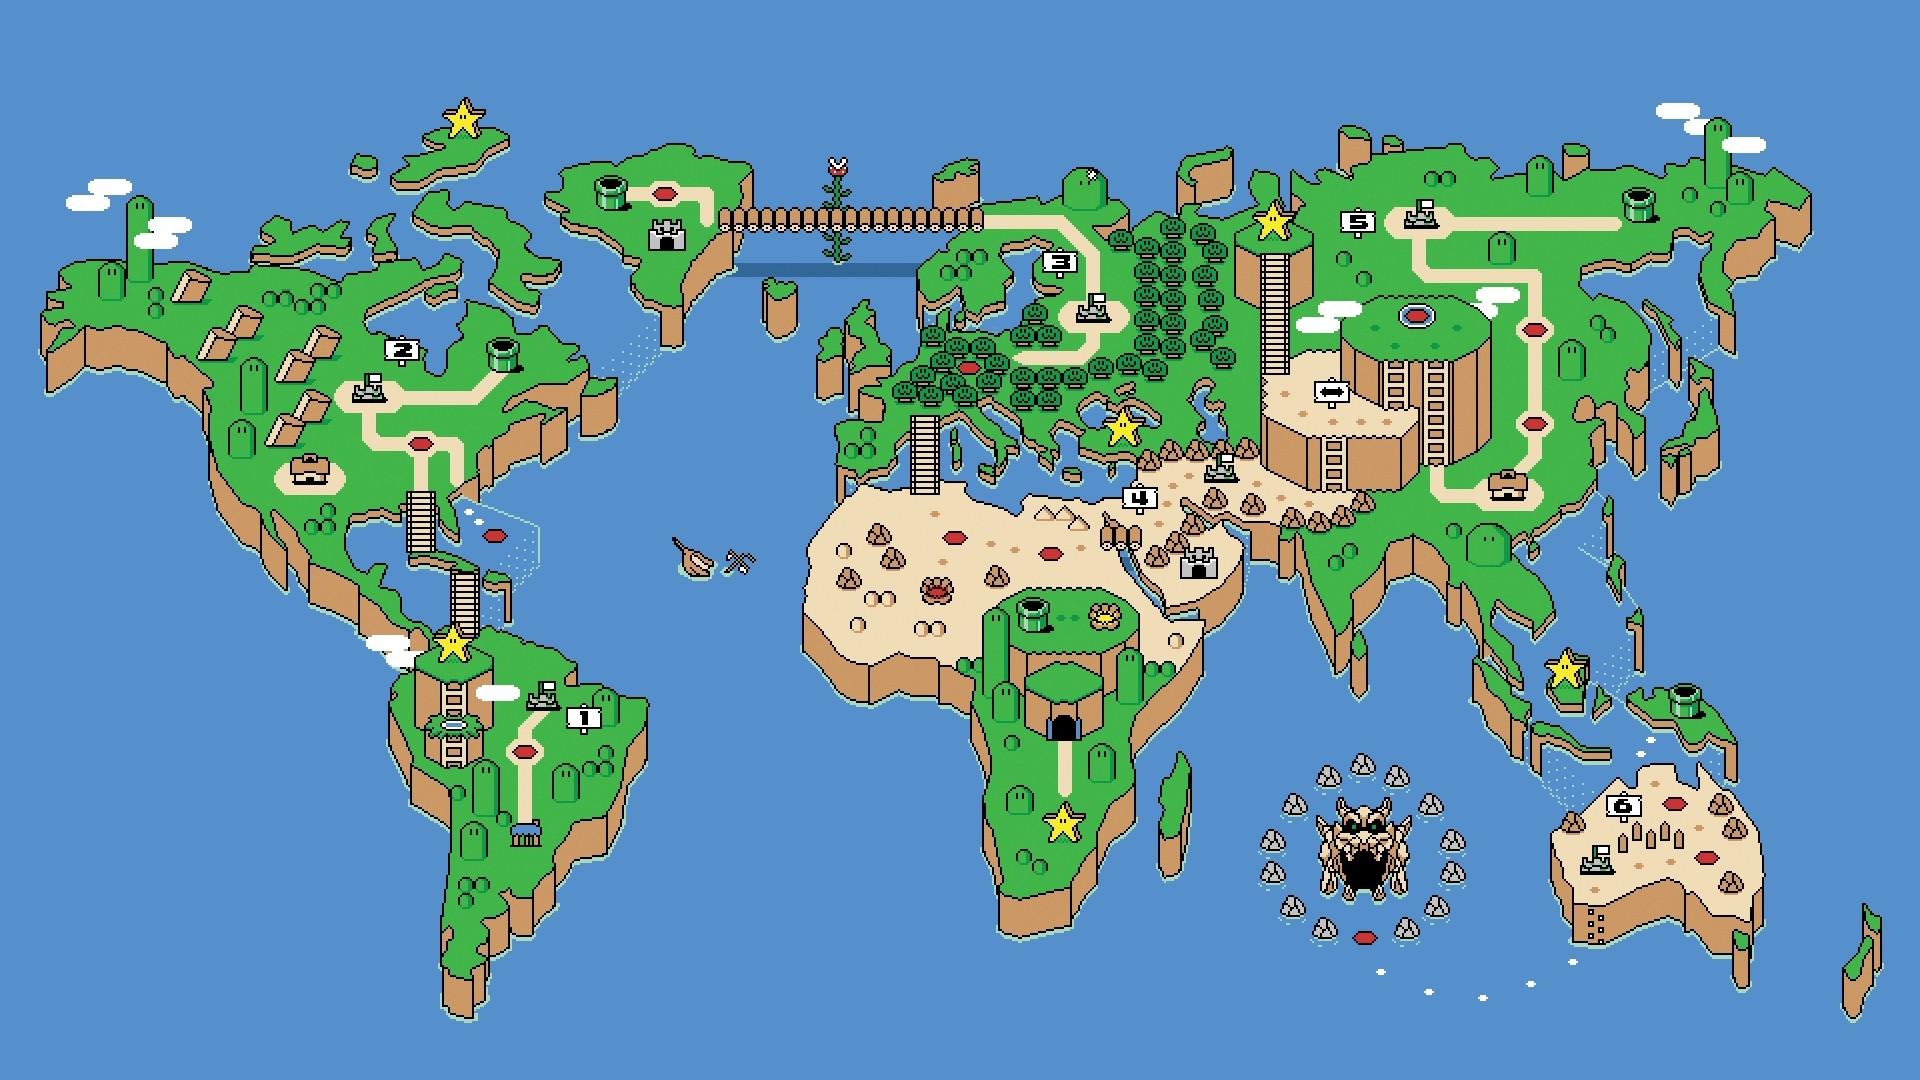 super-mario-world-map-wallpaper-4703-4950-hd-